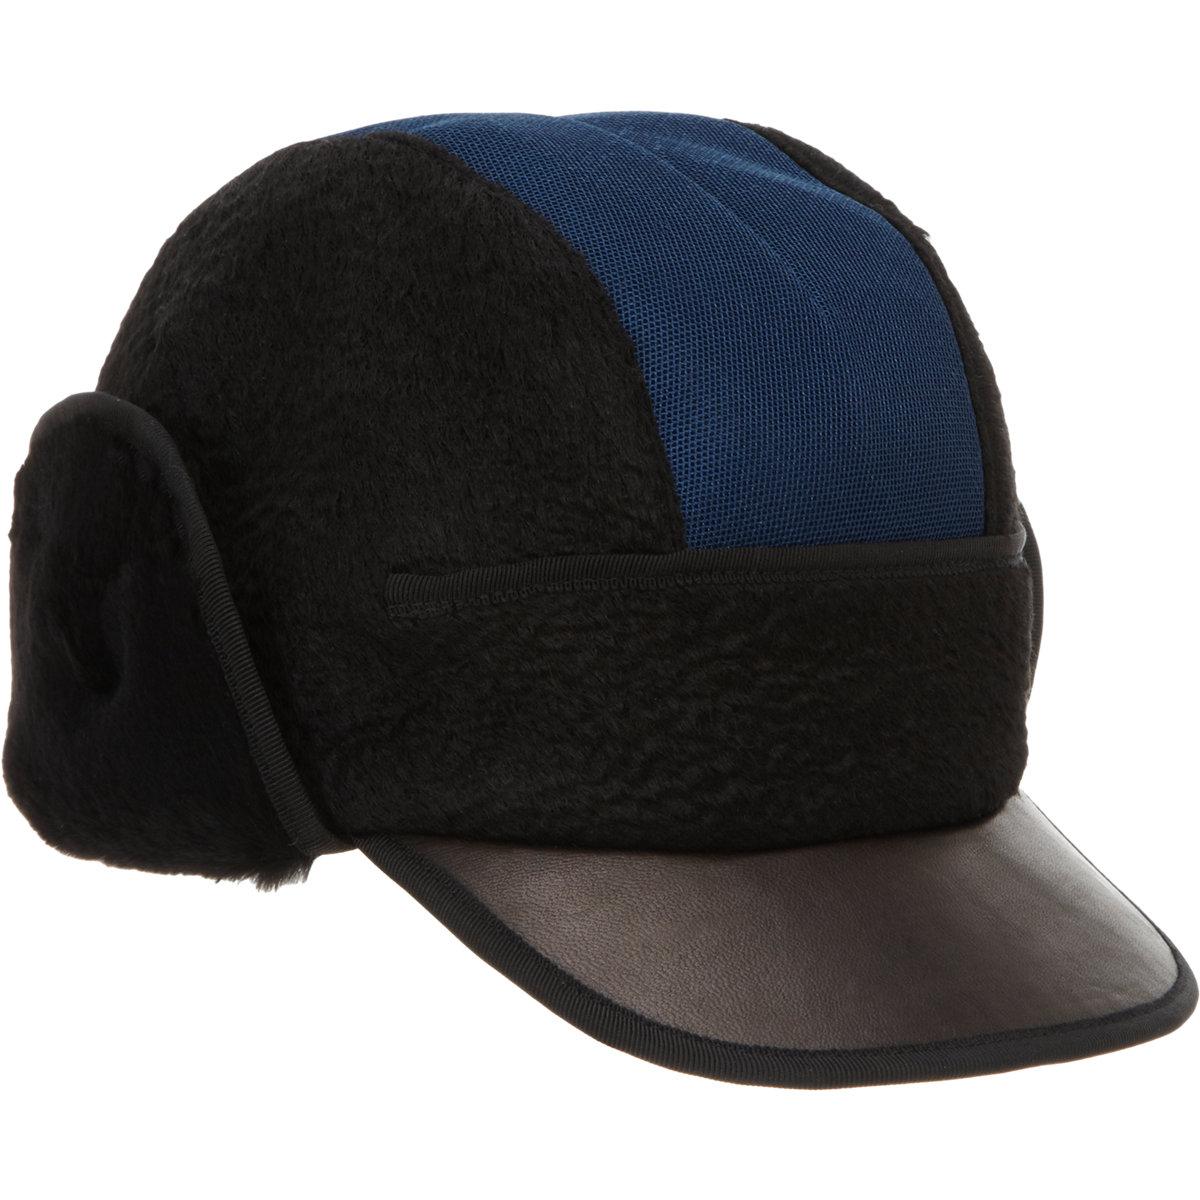 NOEL STEWART Mixed Material Cap $219 Sale